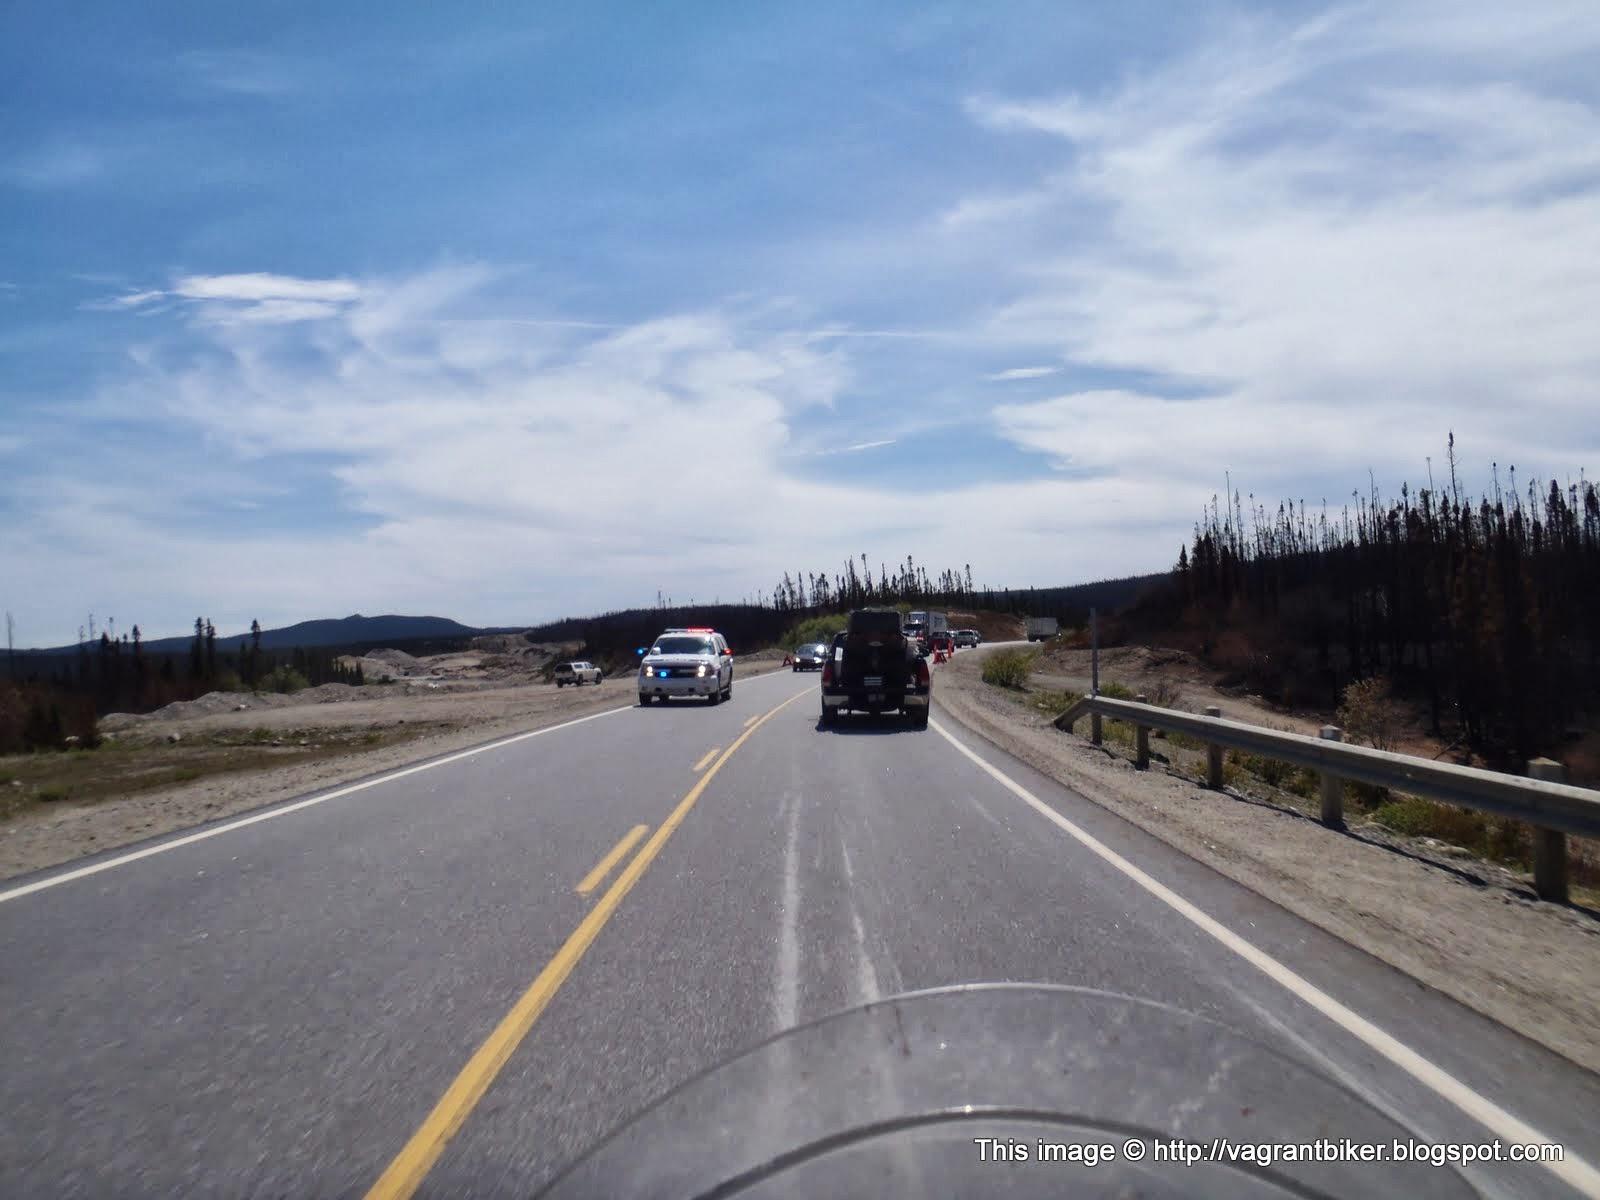 Labrador city escorts Corner Brook Women - Corner Brook Girls - Corner Brook Ladies (Newfoundland and Labrador, Canada)